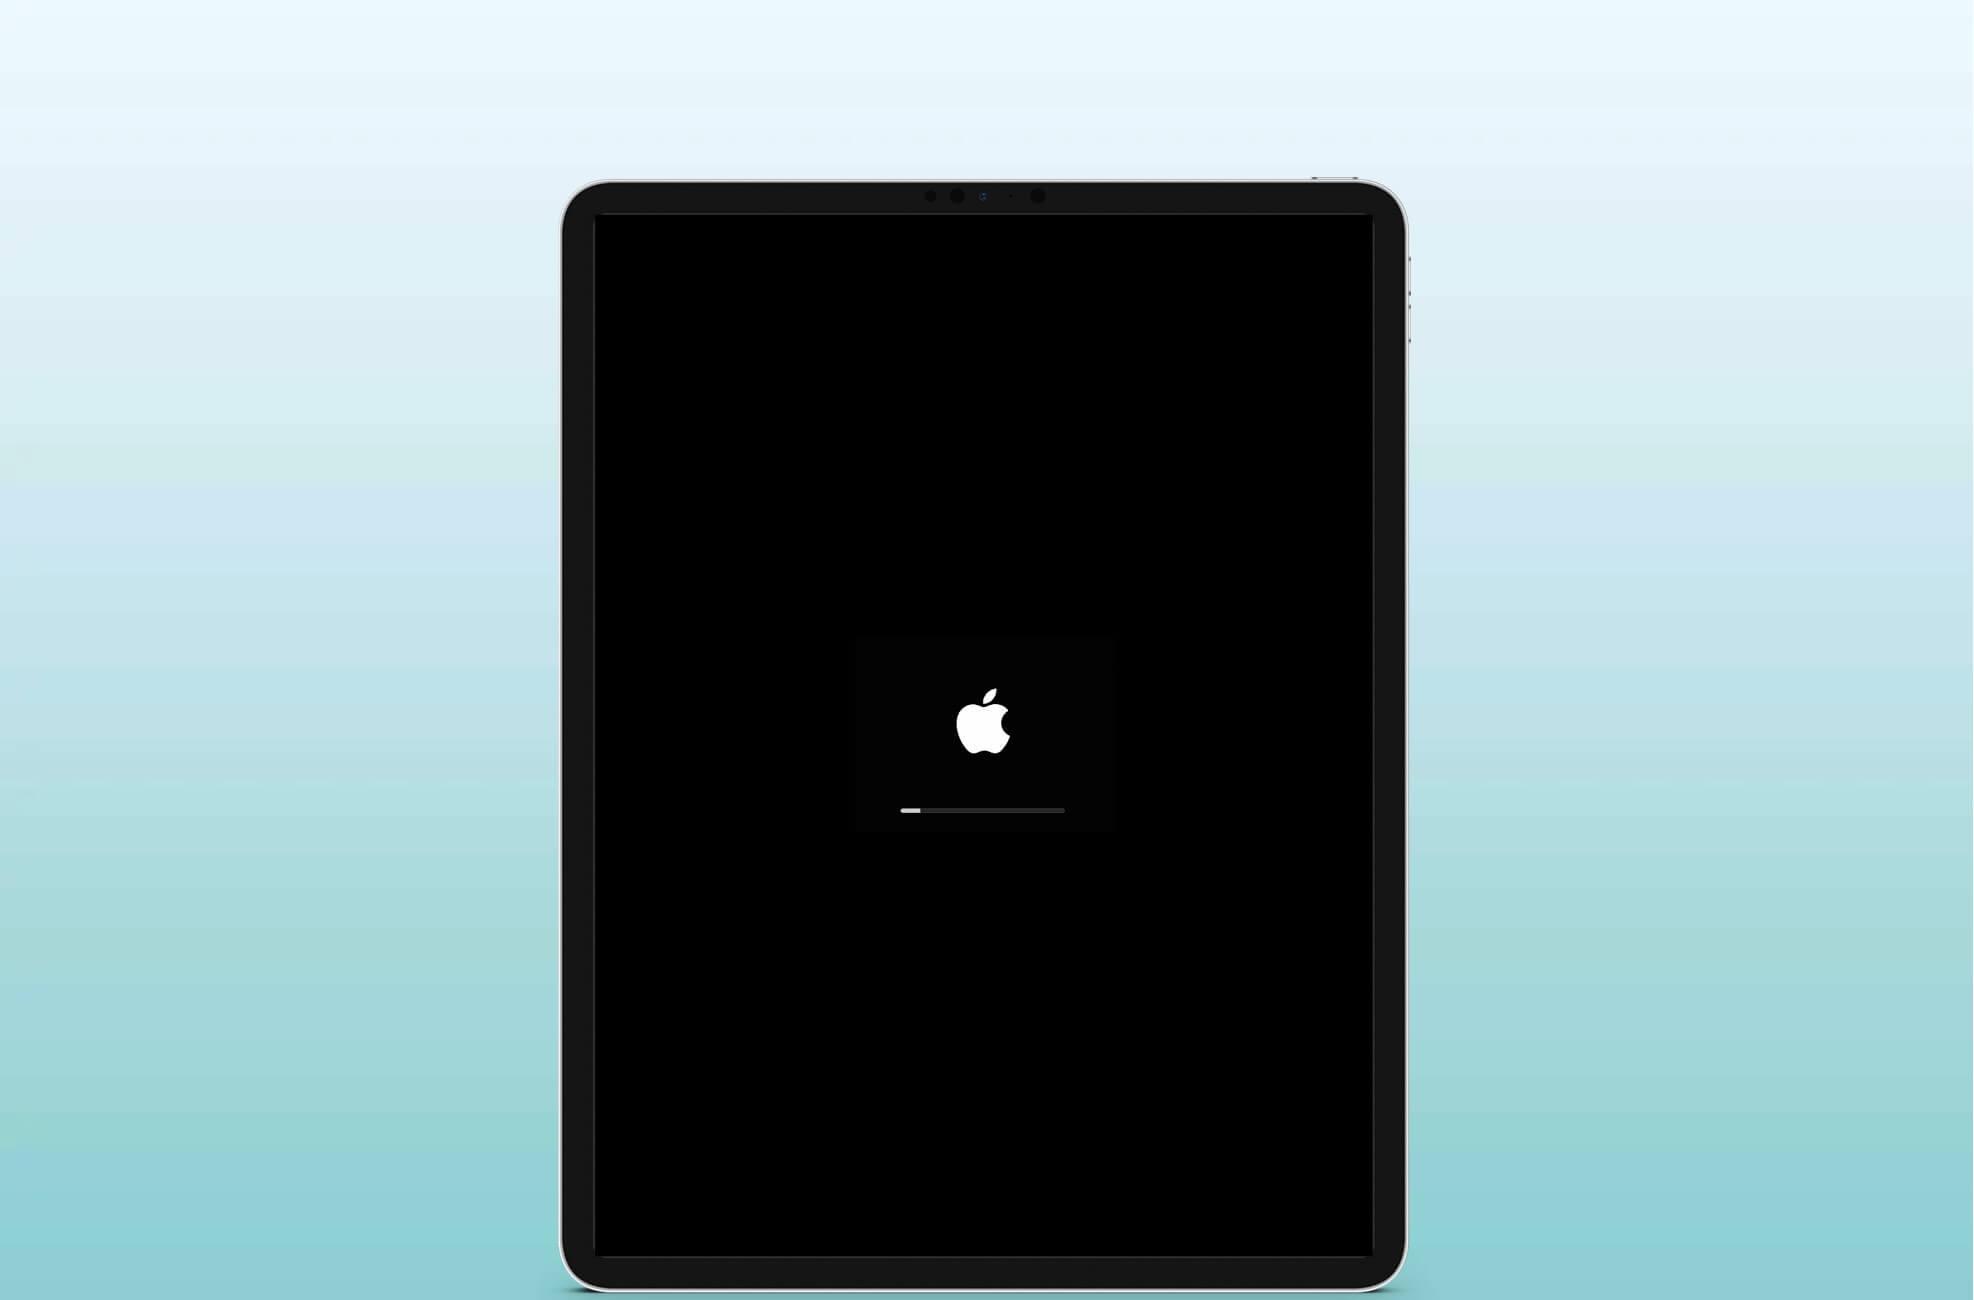 Restart iPad that has Face ID